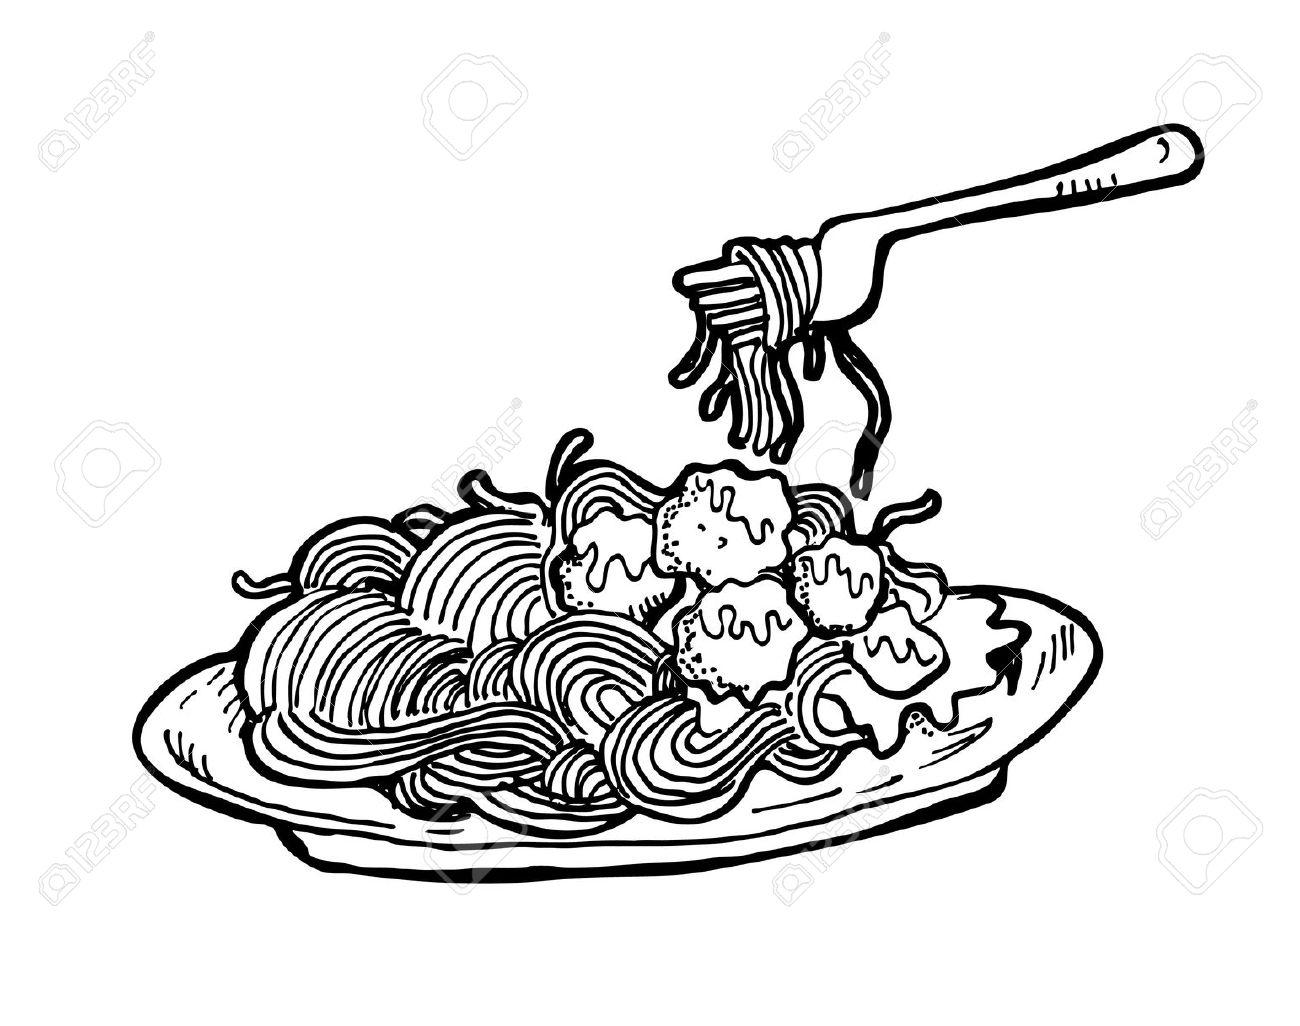 1300x1026 Meatball Clipart Pasta Noodle